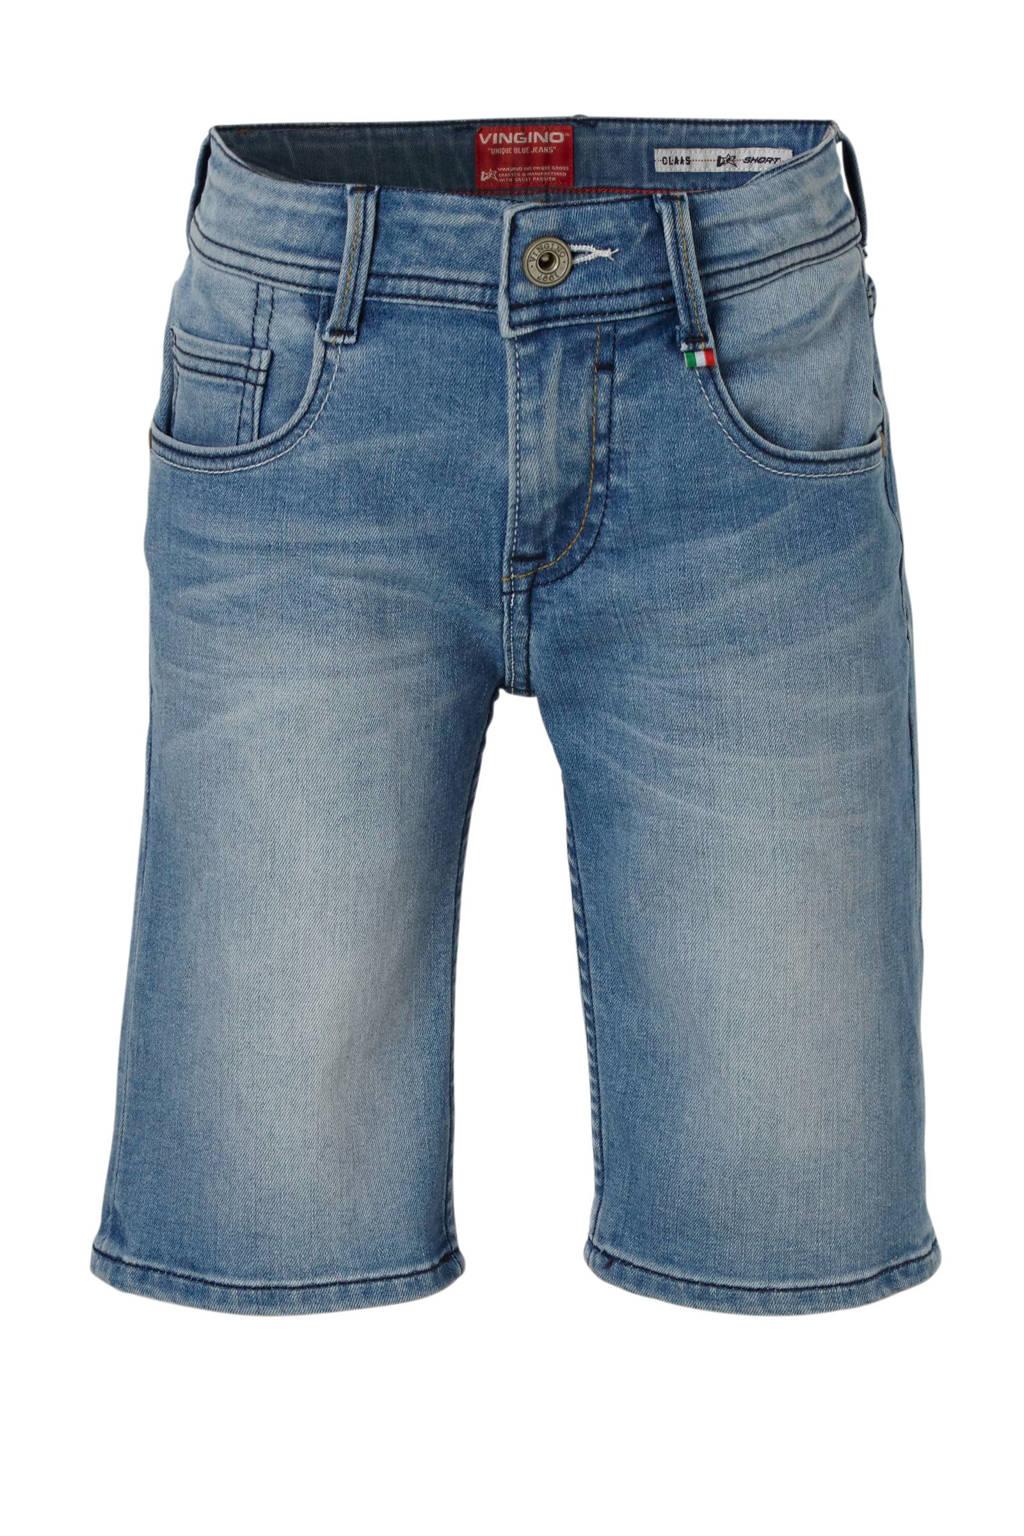 Vingino regular fit jeans bermuda Claas, Light Indigo